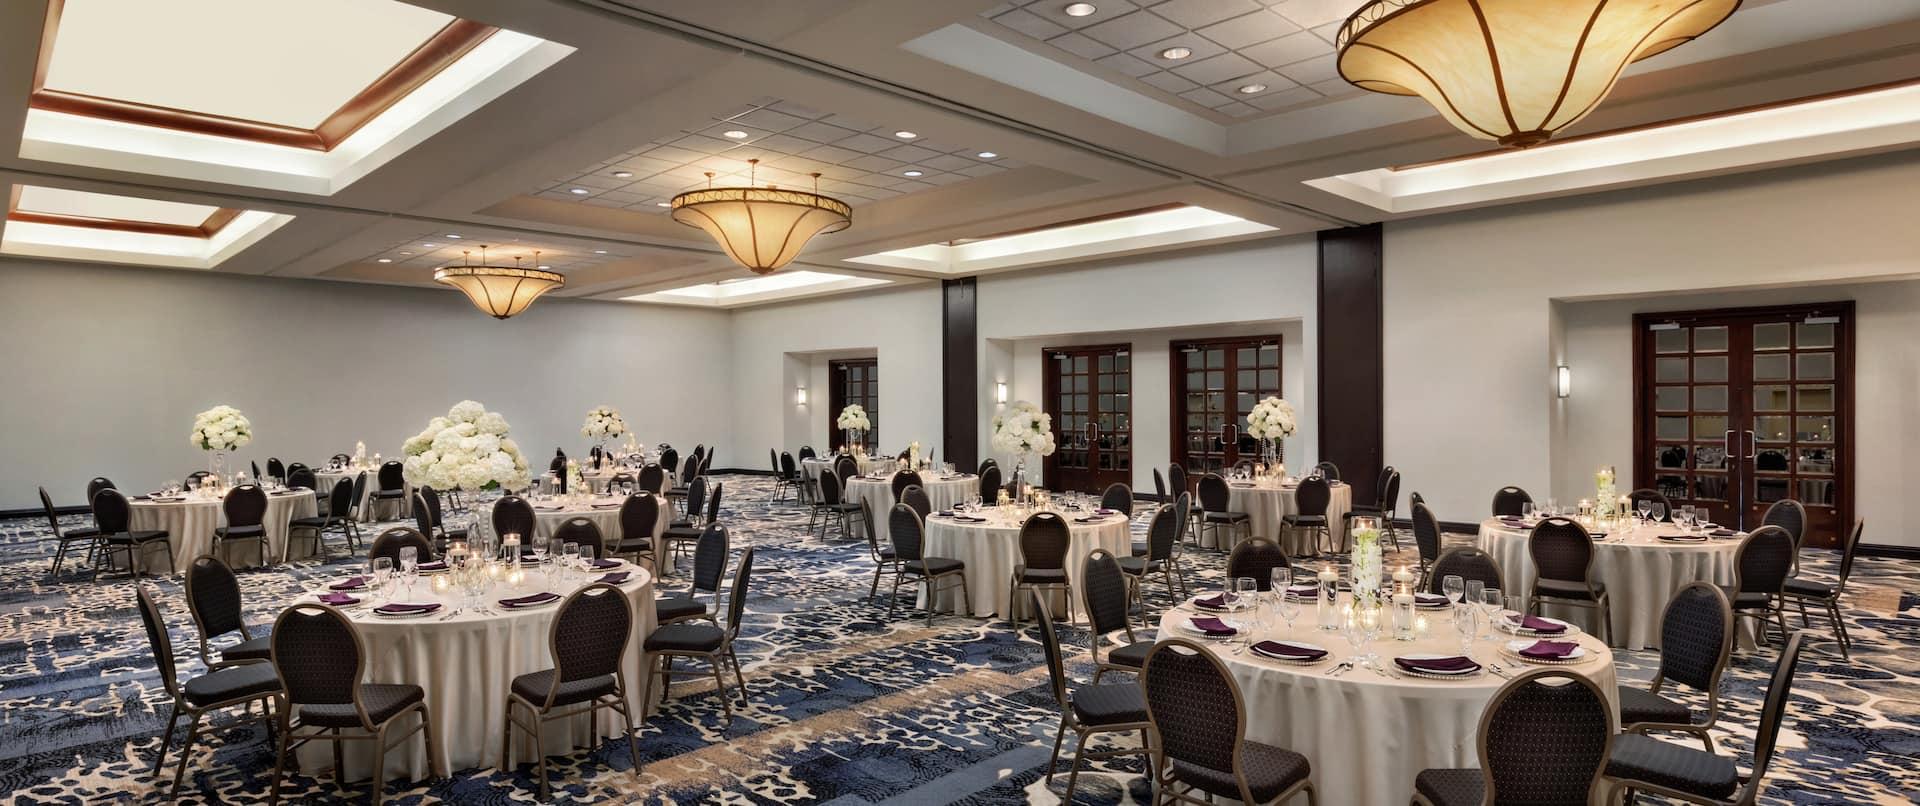 Elegant Meeting and Ballroom Area